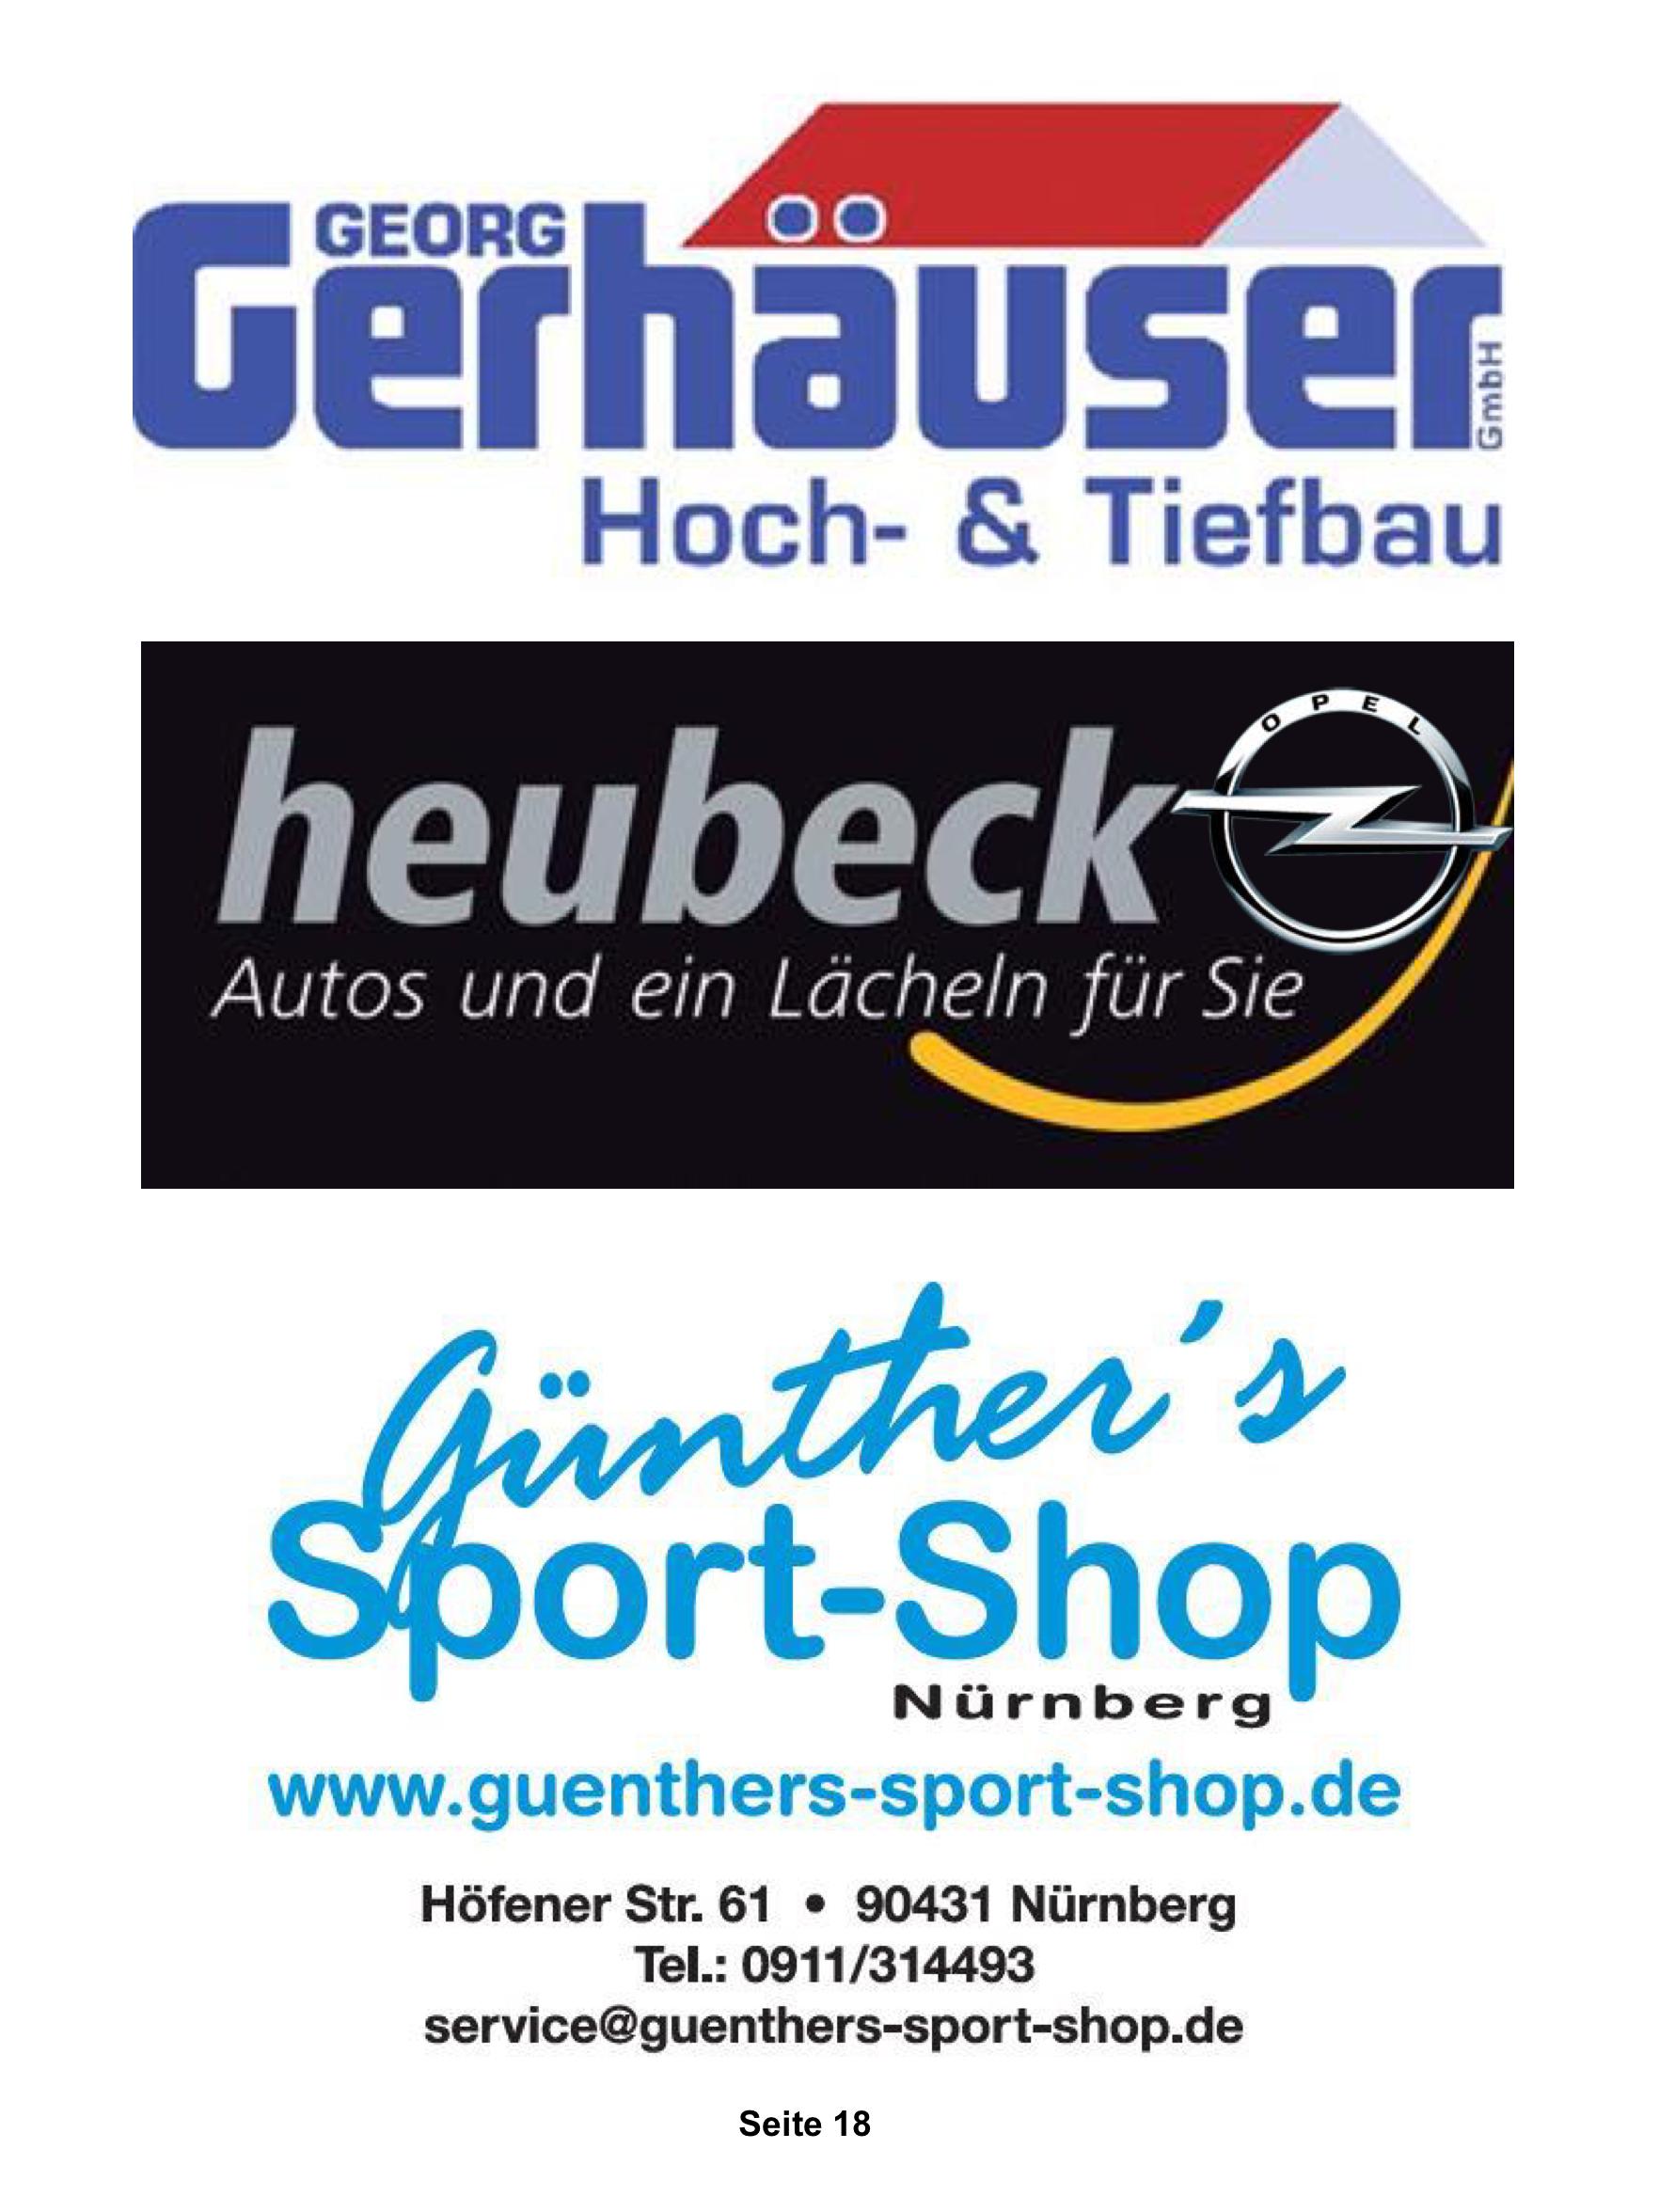 Hersbruck-18.png